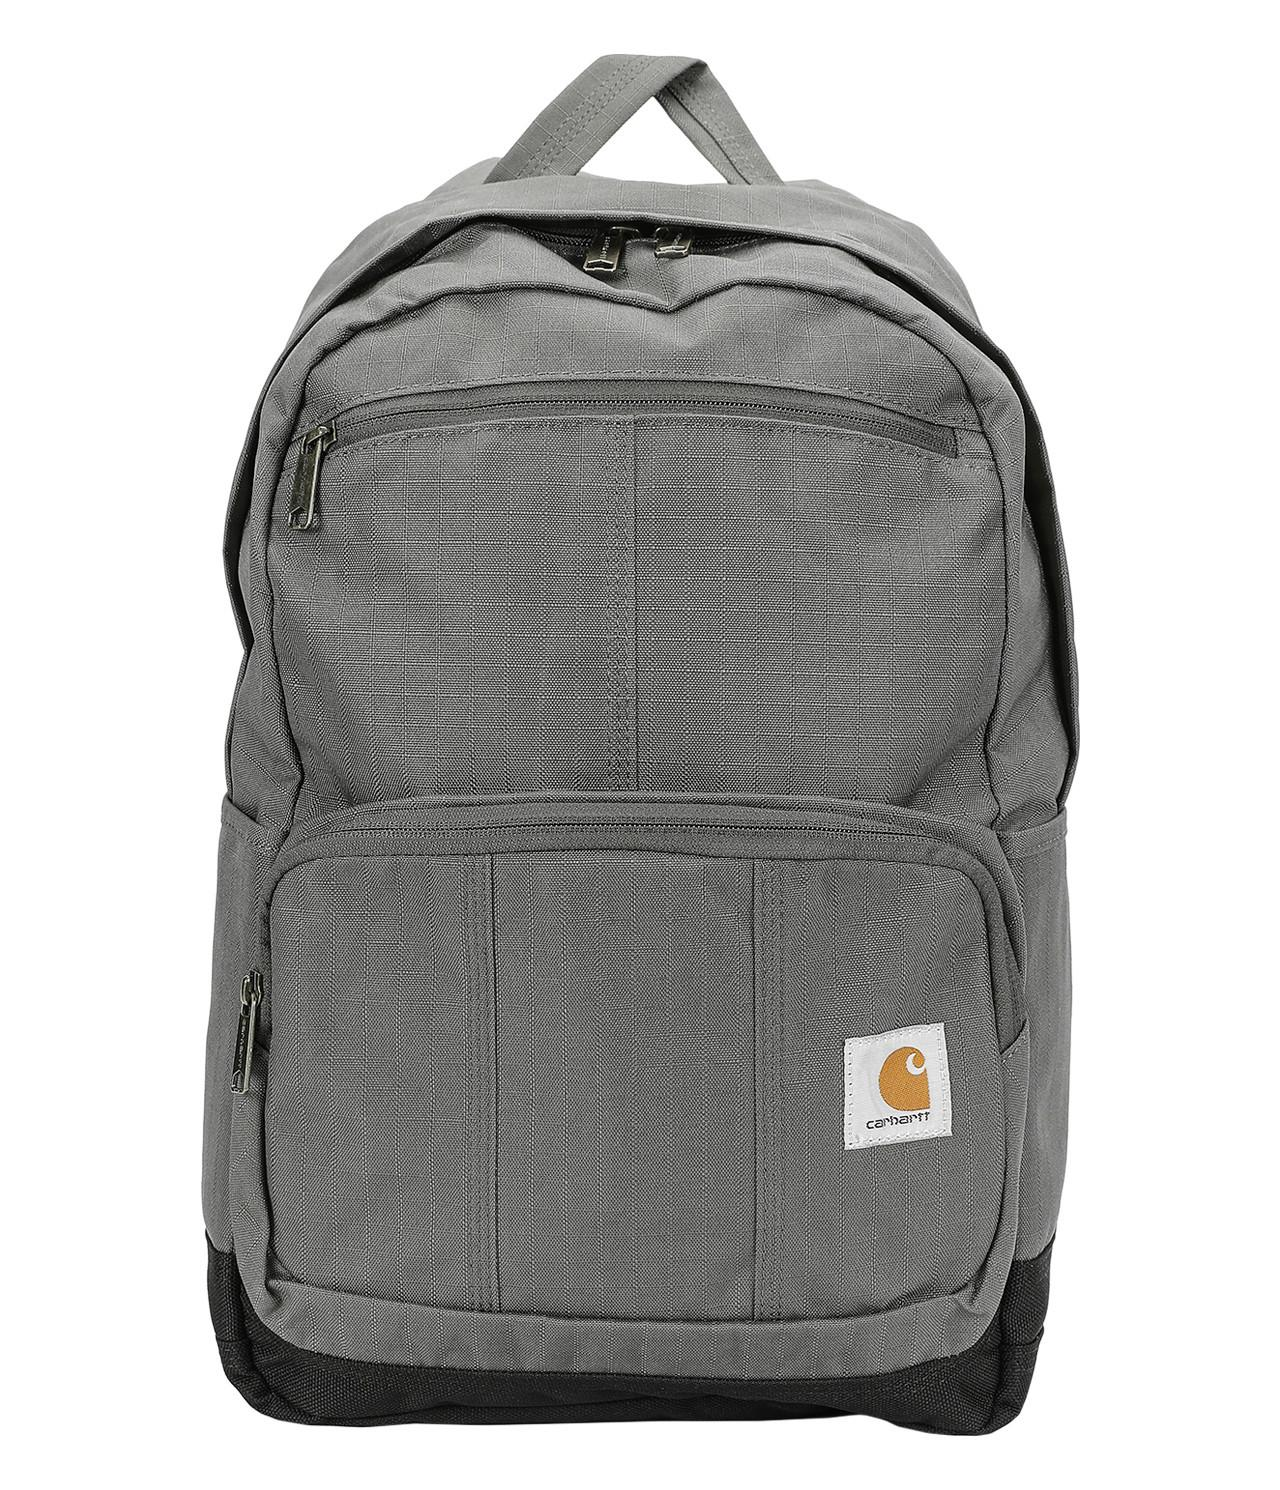 d123b3188a Carhartt D89 Backpack in Gray for Men - Lyst